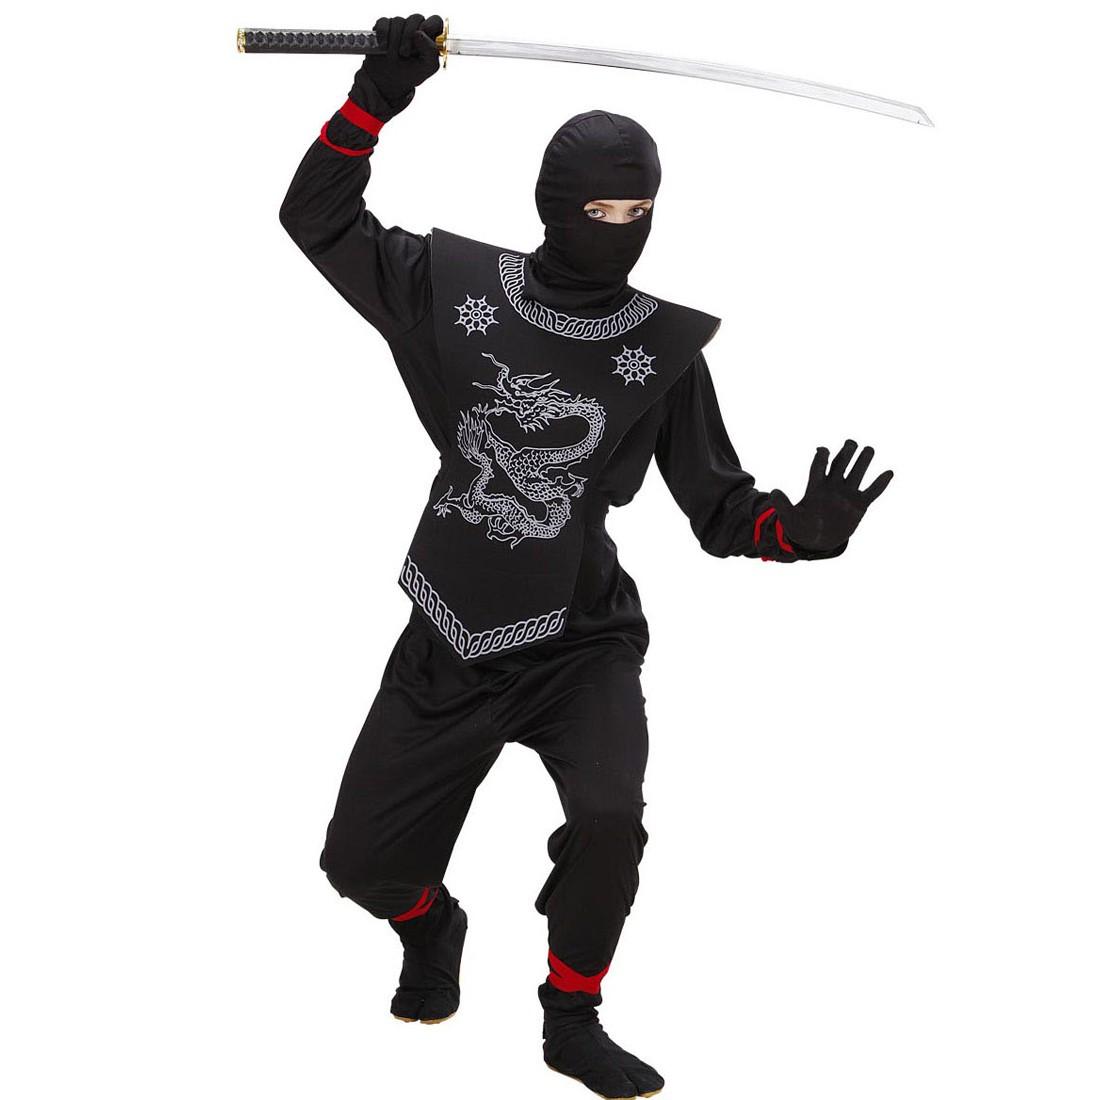 schwarzer ninja kost m kinder ninjakost m samurai kinderkost m asia k mpfer kriegerkost m japan. Black Bedroom Furniture Sets. Home Design Ideas